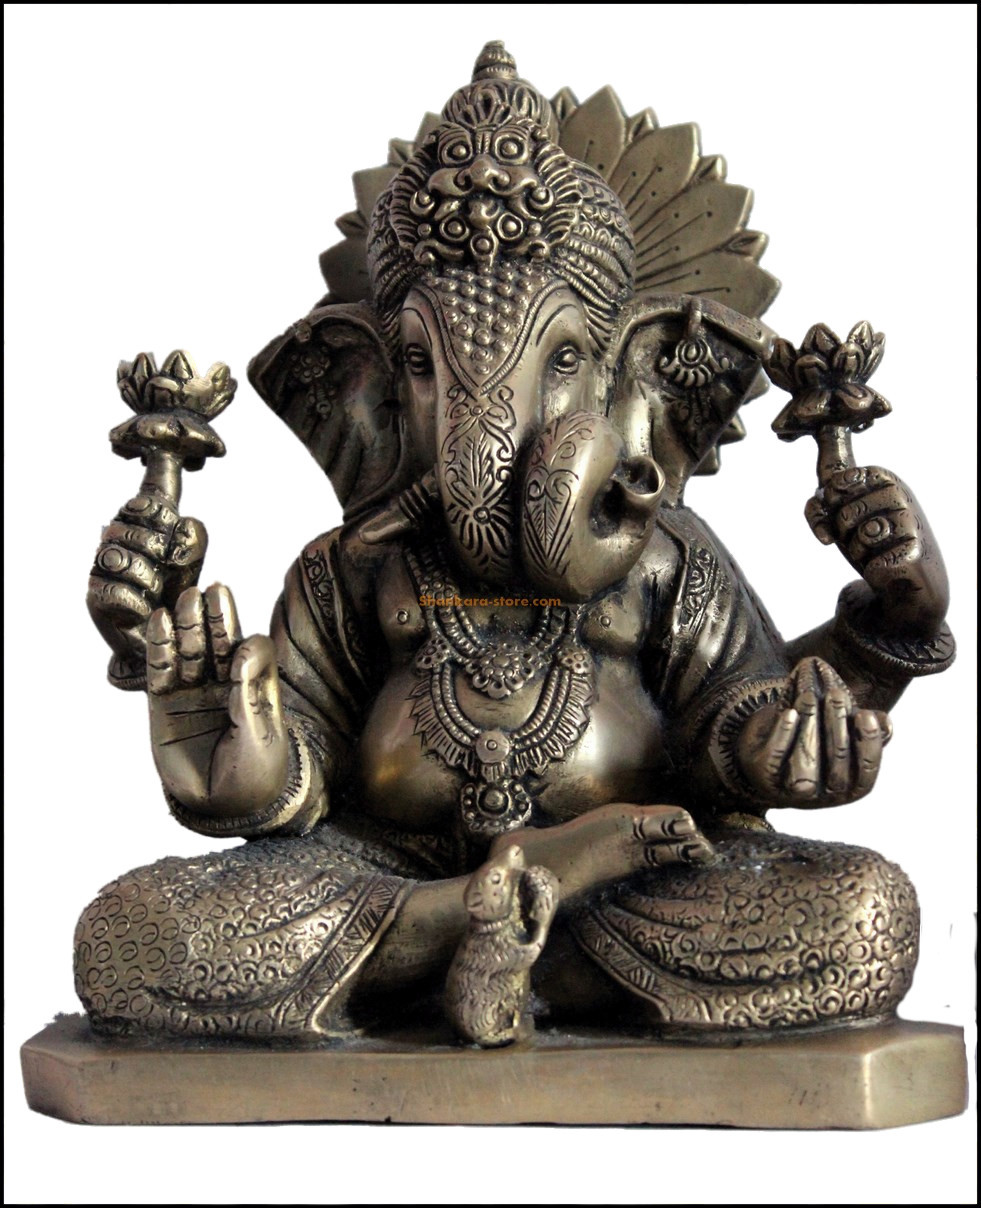 Shankara-Store.com statue statuette Ganeshi Ganapati bronze